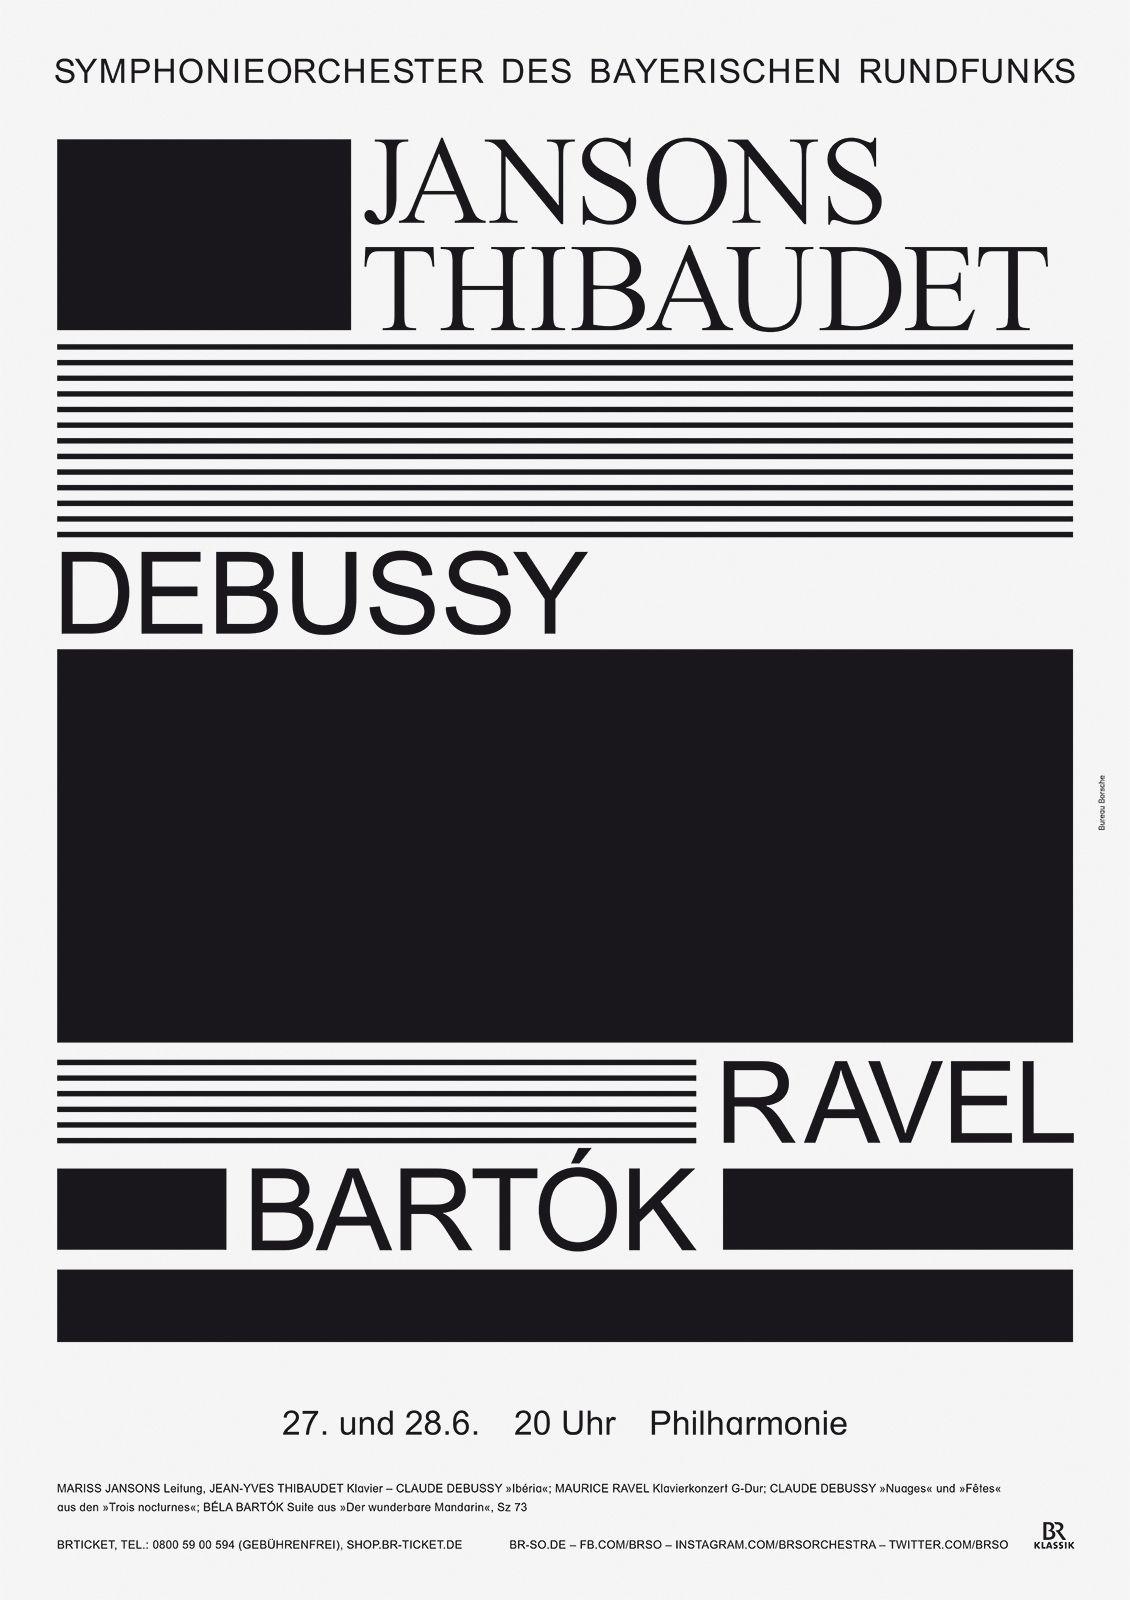 Instant Classic Bureau Borsche S Typographic Posters For Br